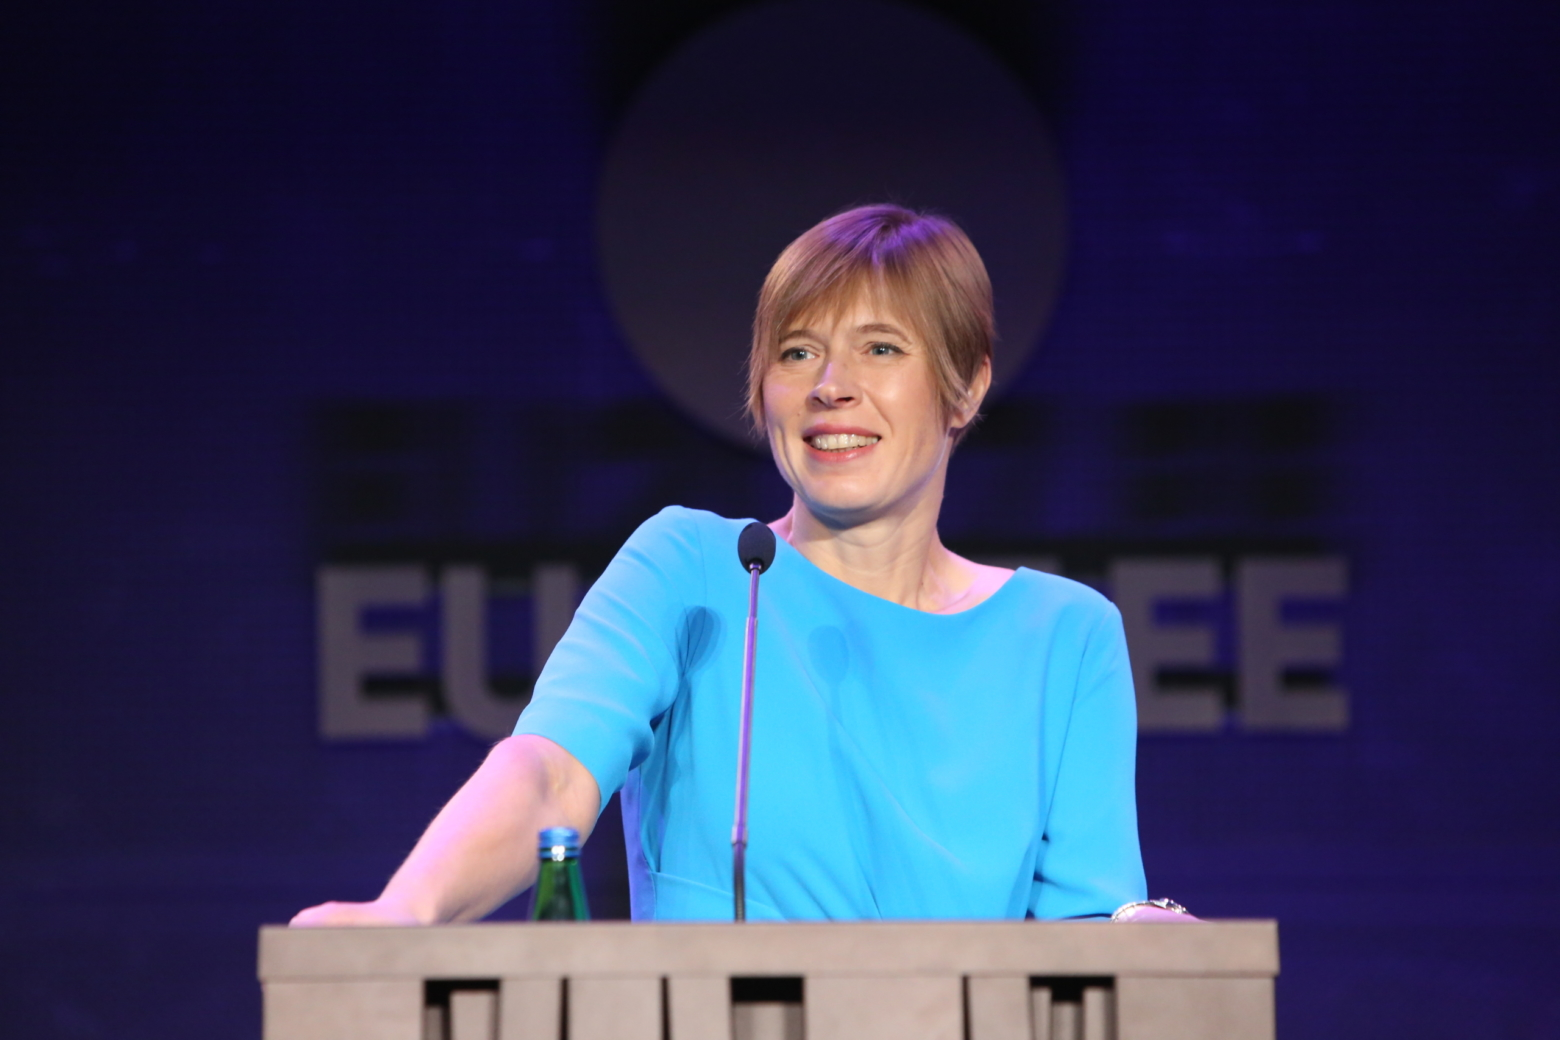 Kersti Kaljulaid ©Annika Haas (EU2017EE)